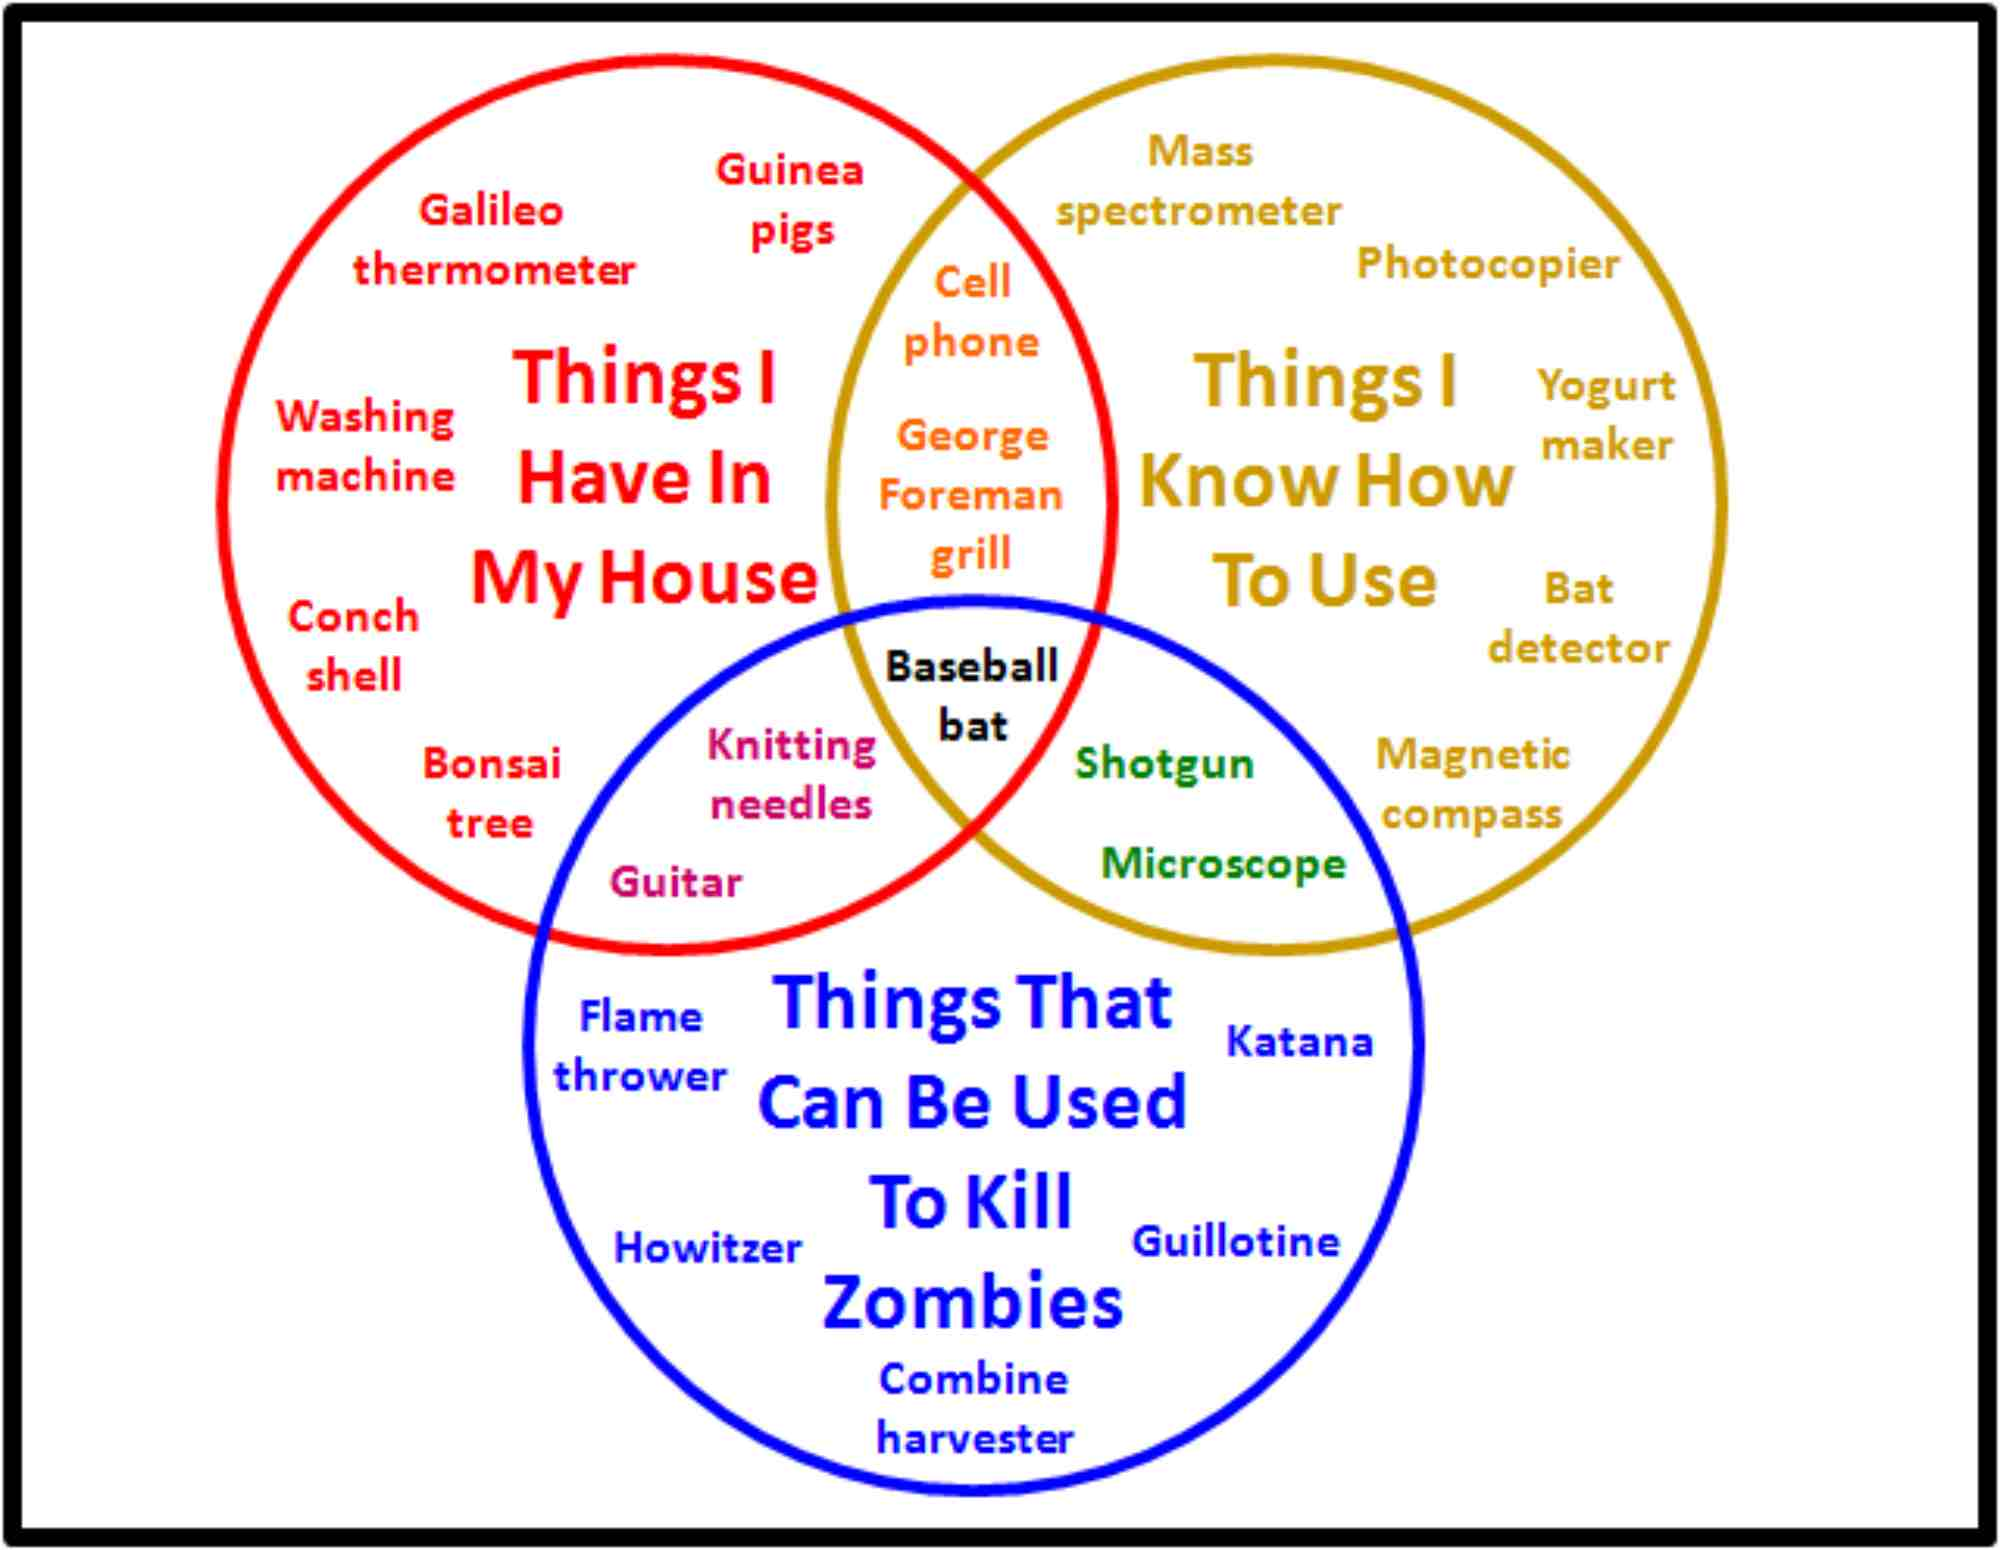 venn diagram in word 2013